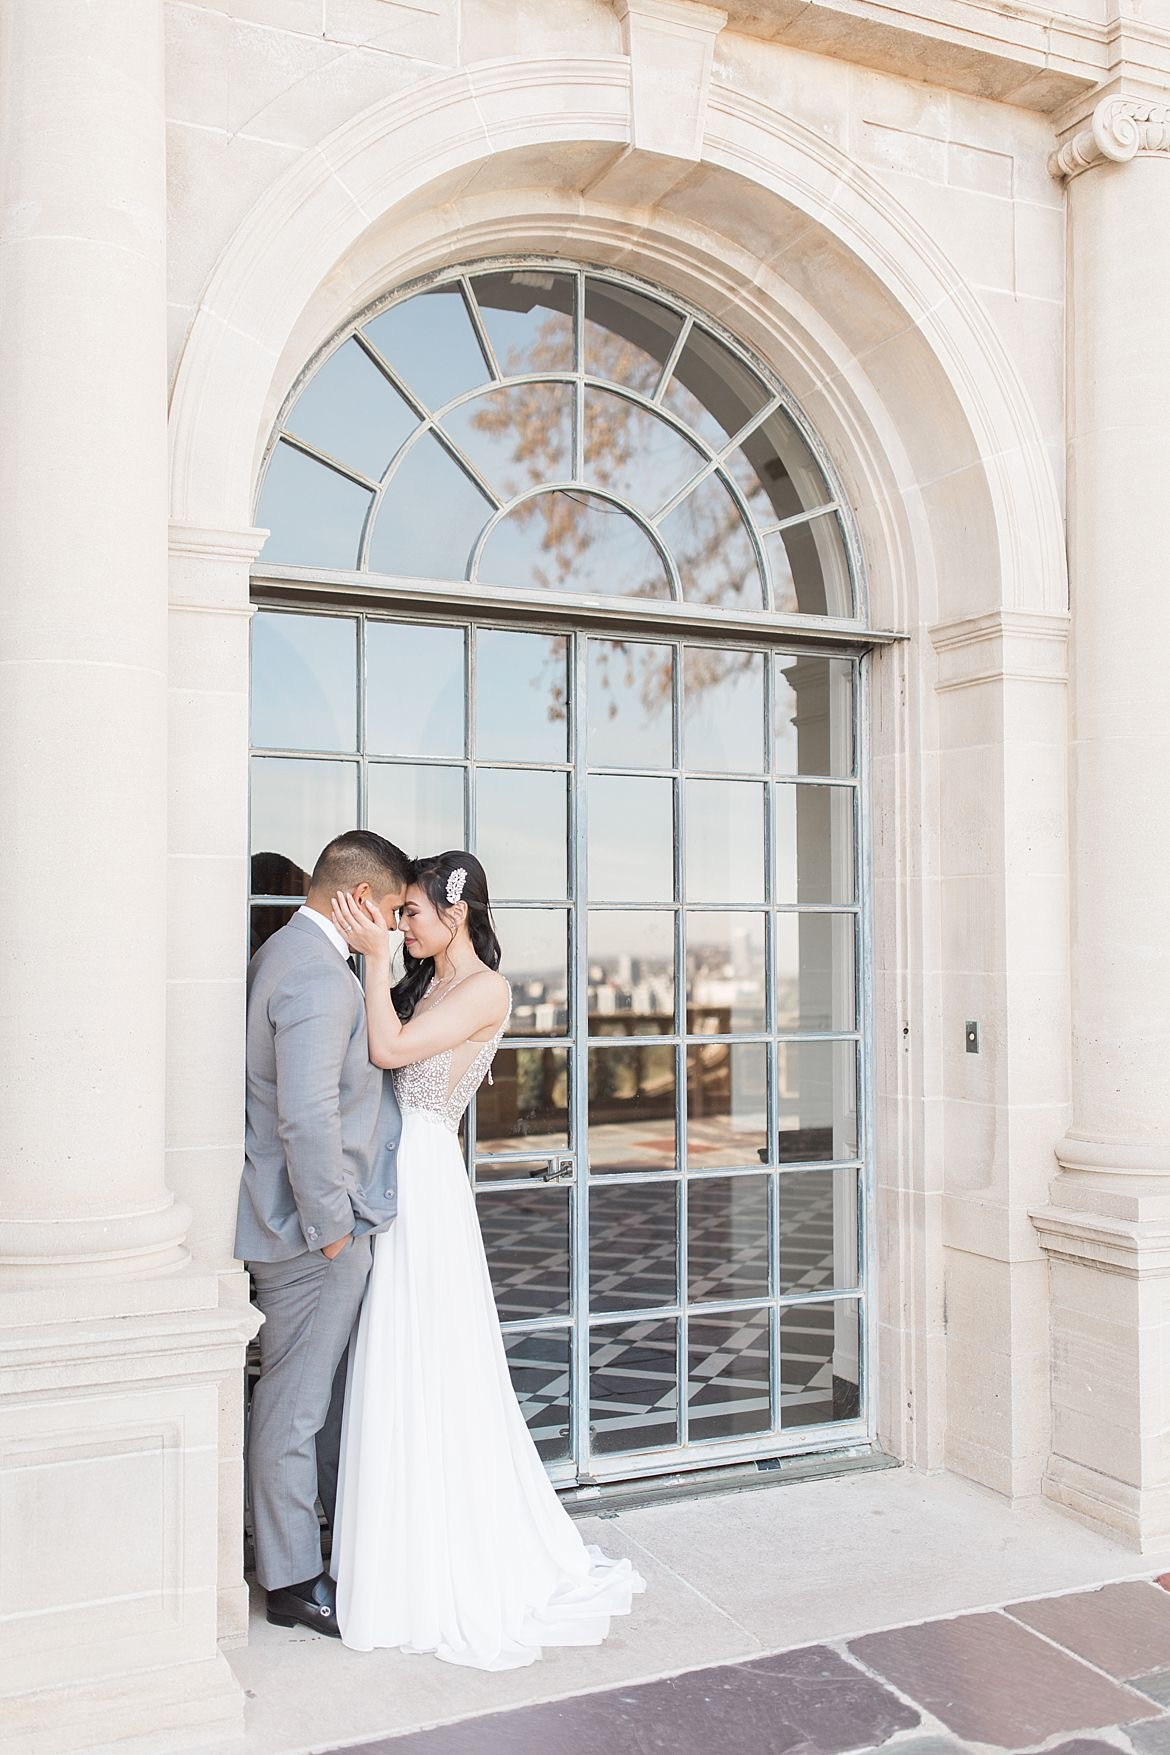 Greystone Mansion Engagement Session